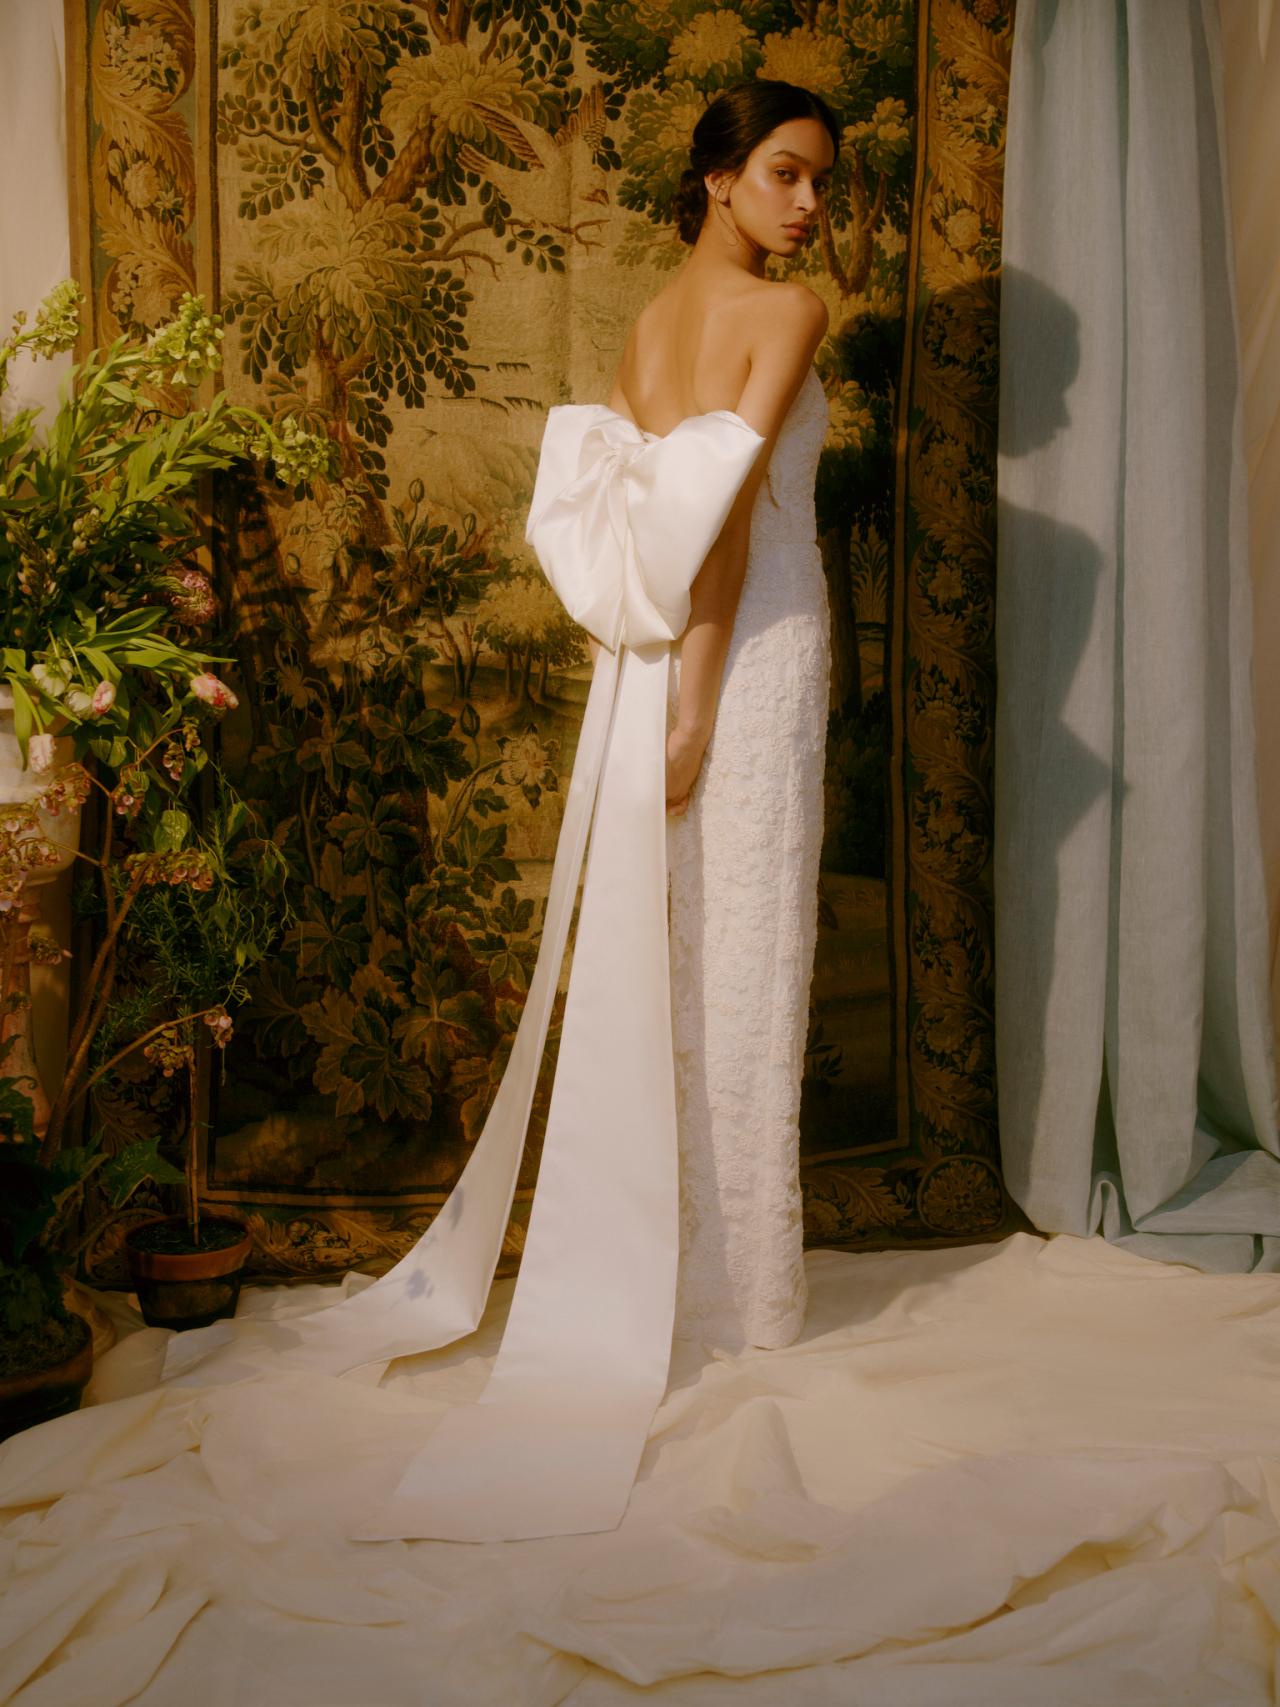 9 tendencias top en vestidos de novia 2022 the bridal council